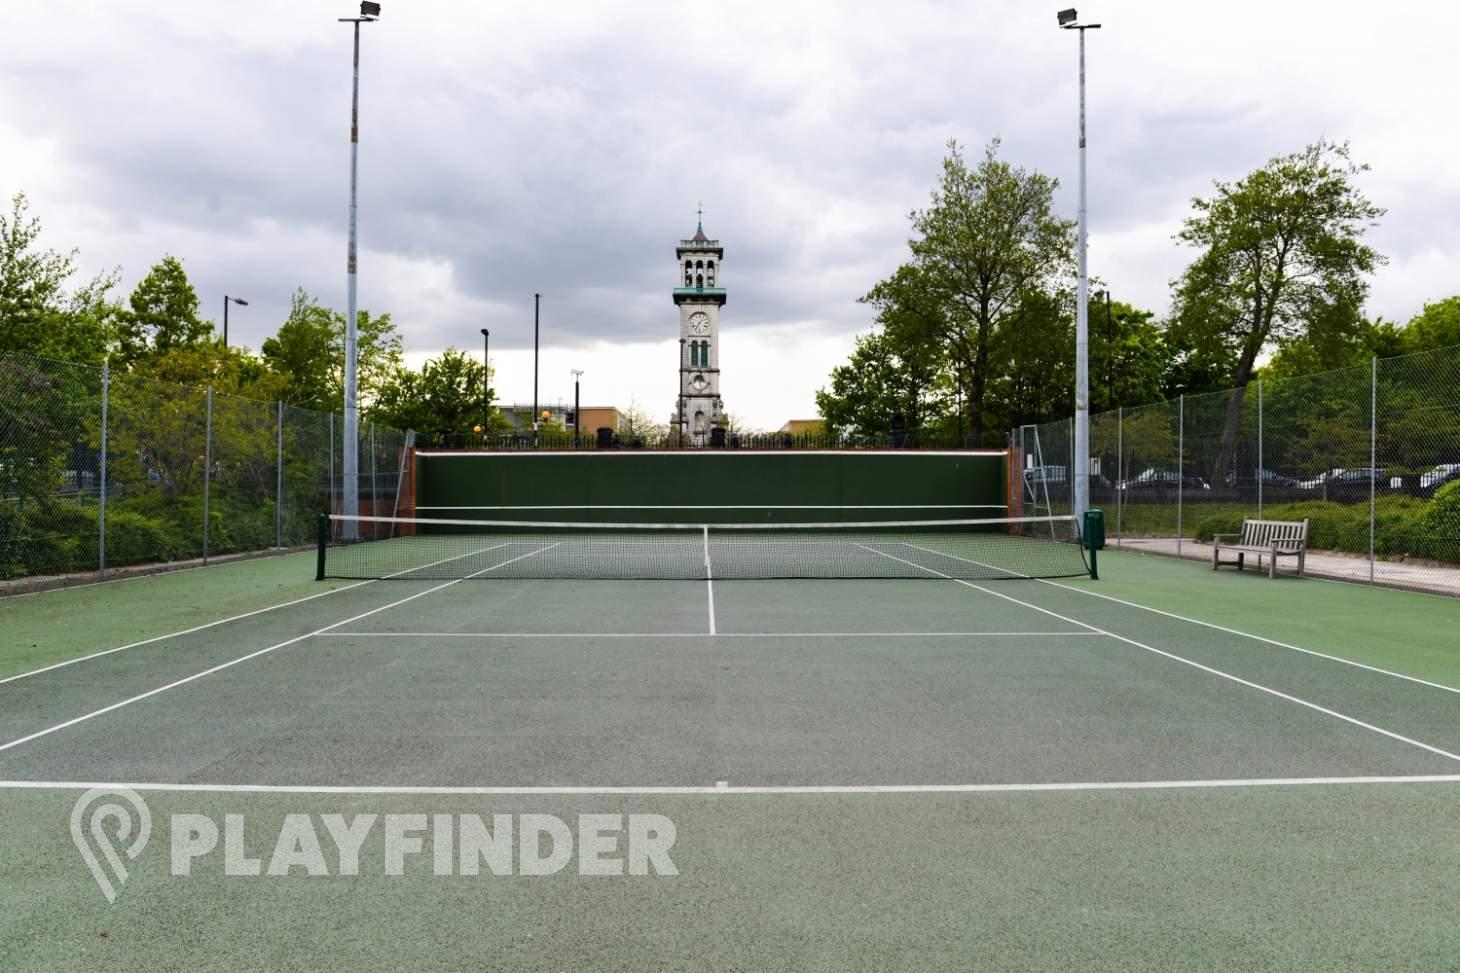 Islington Tennis Centre